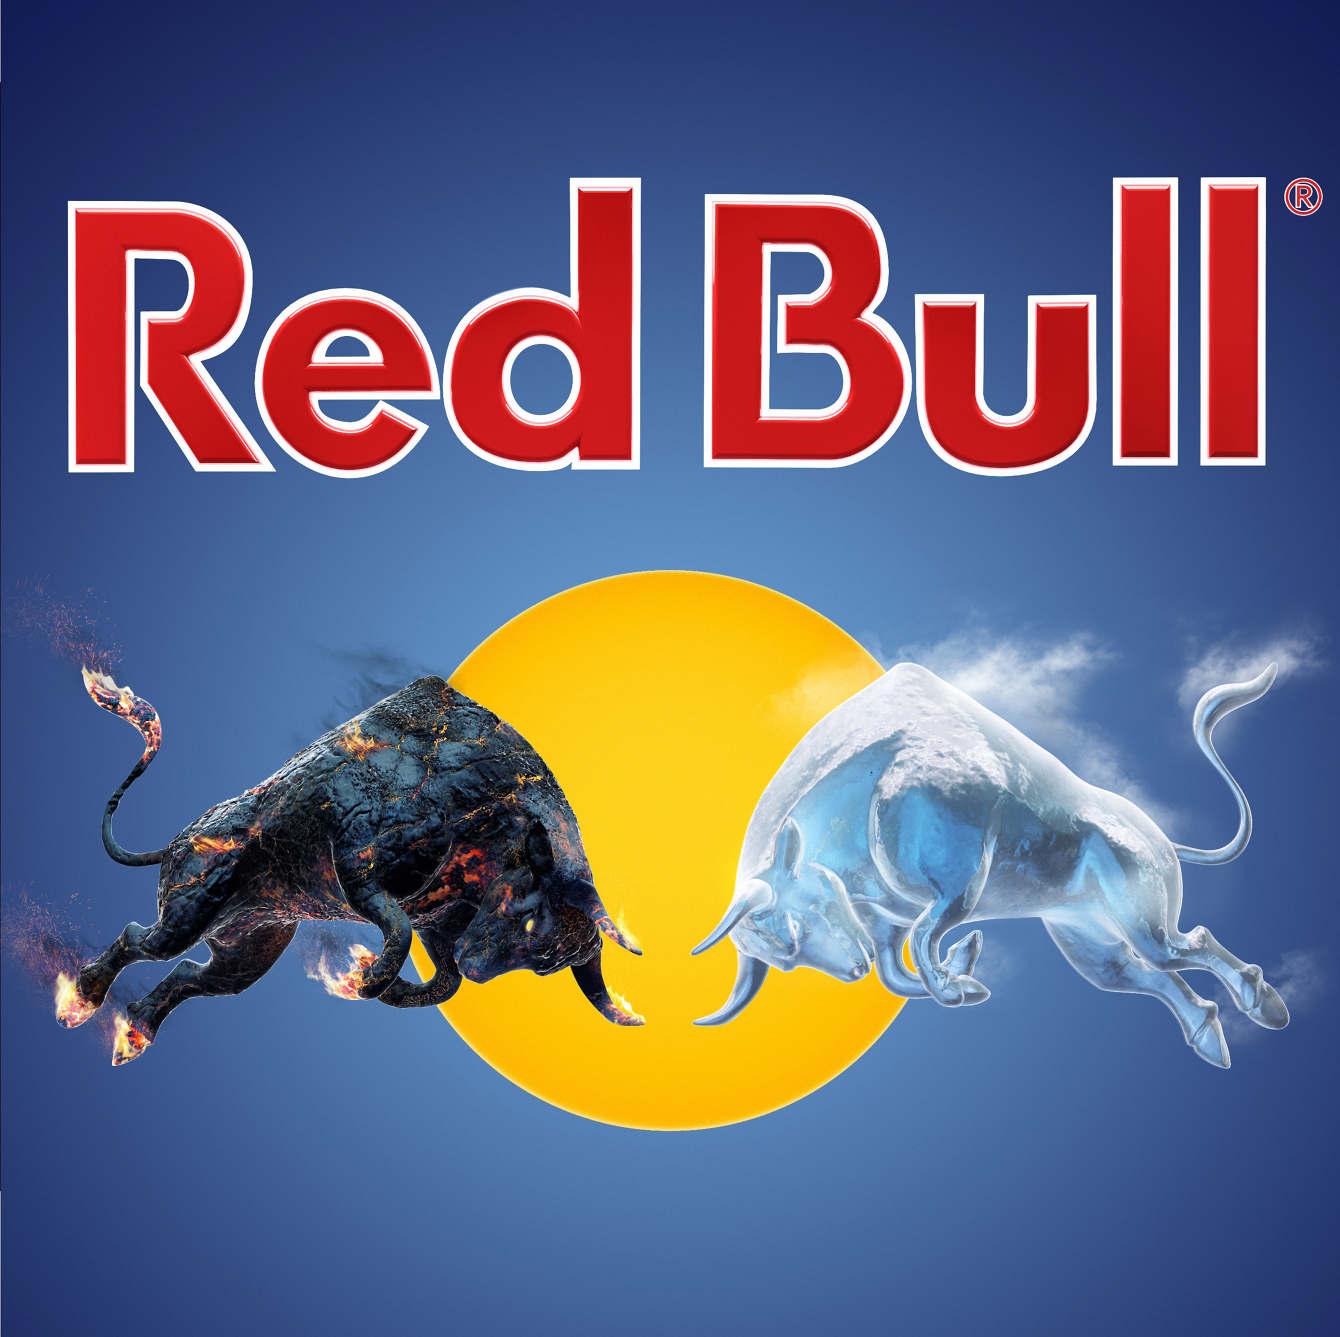 Red-Bull-brand-development-redicelava_1340_c.jpg